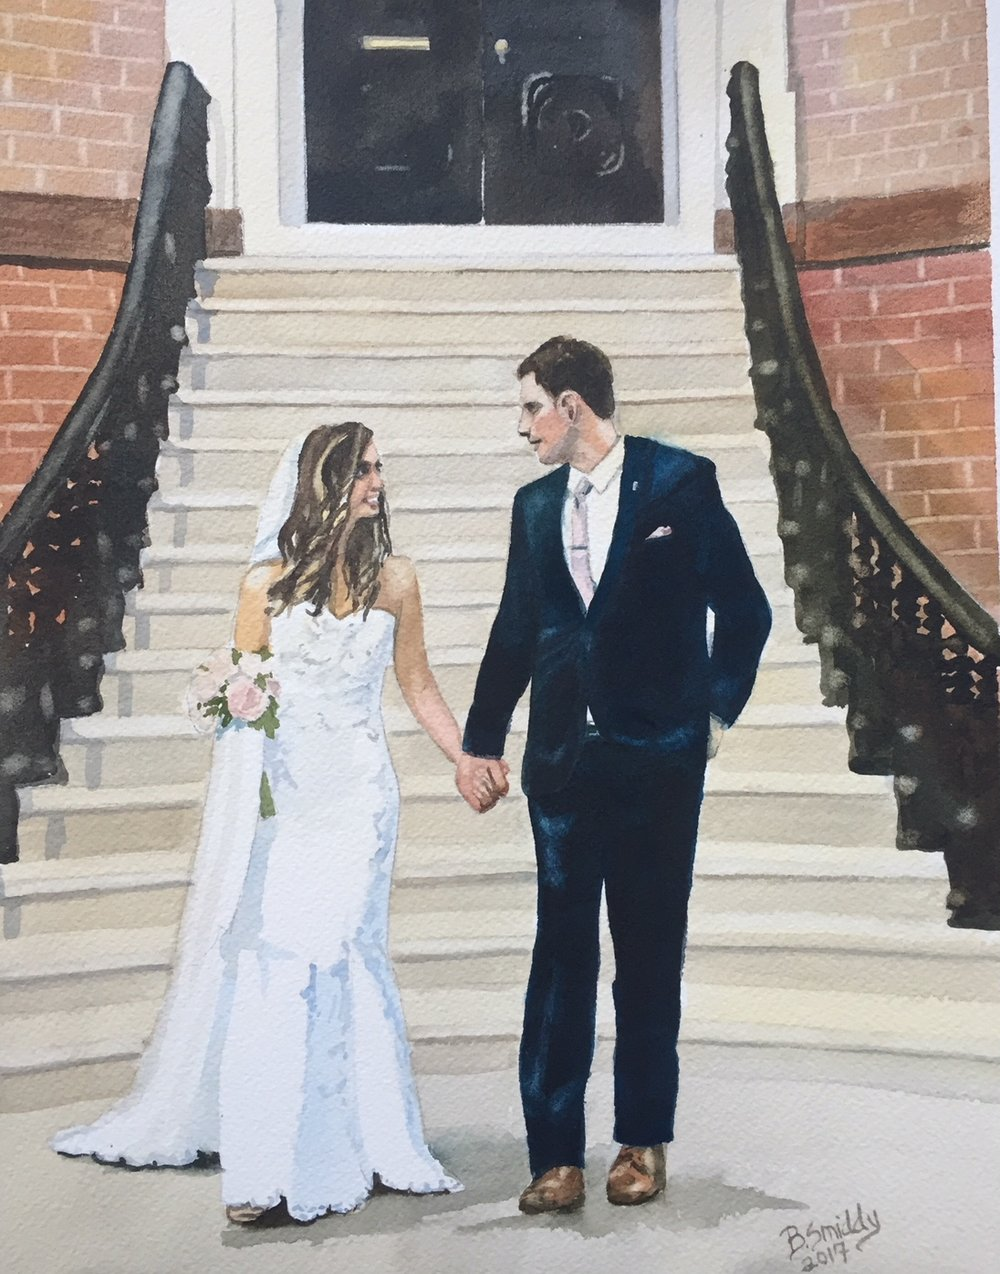 custom wedding watercolor portrait painting